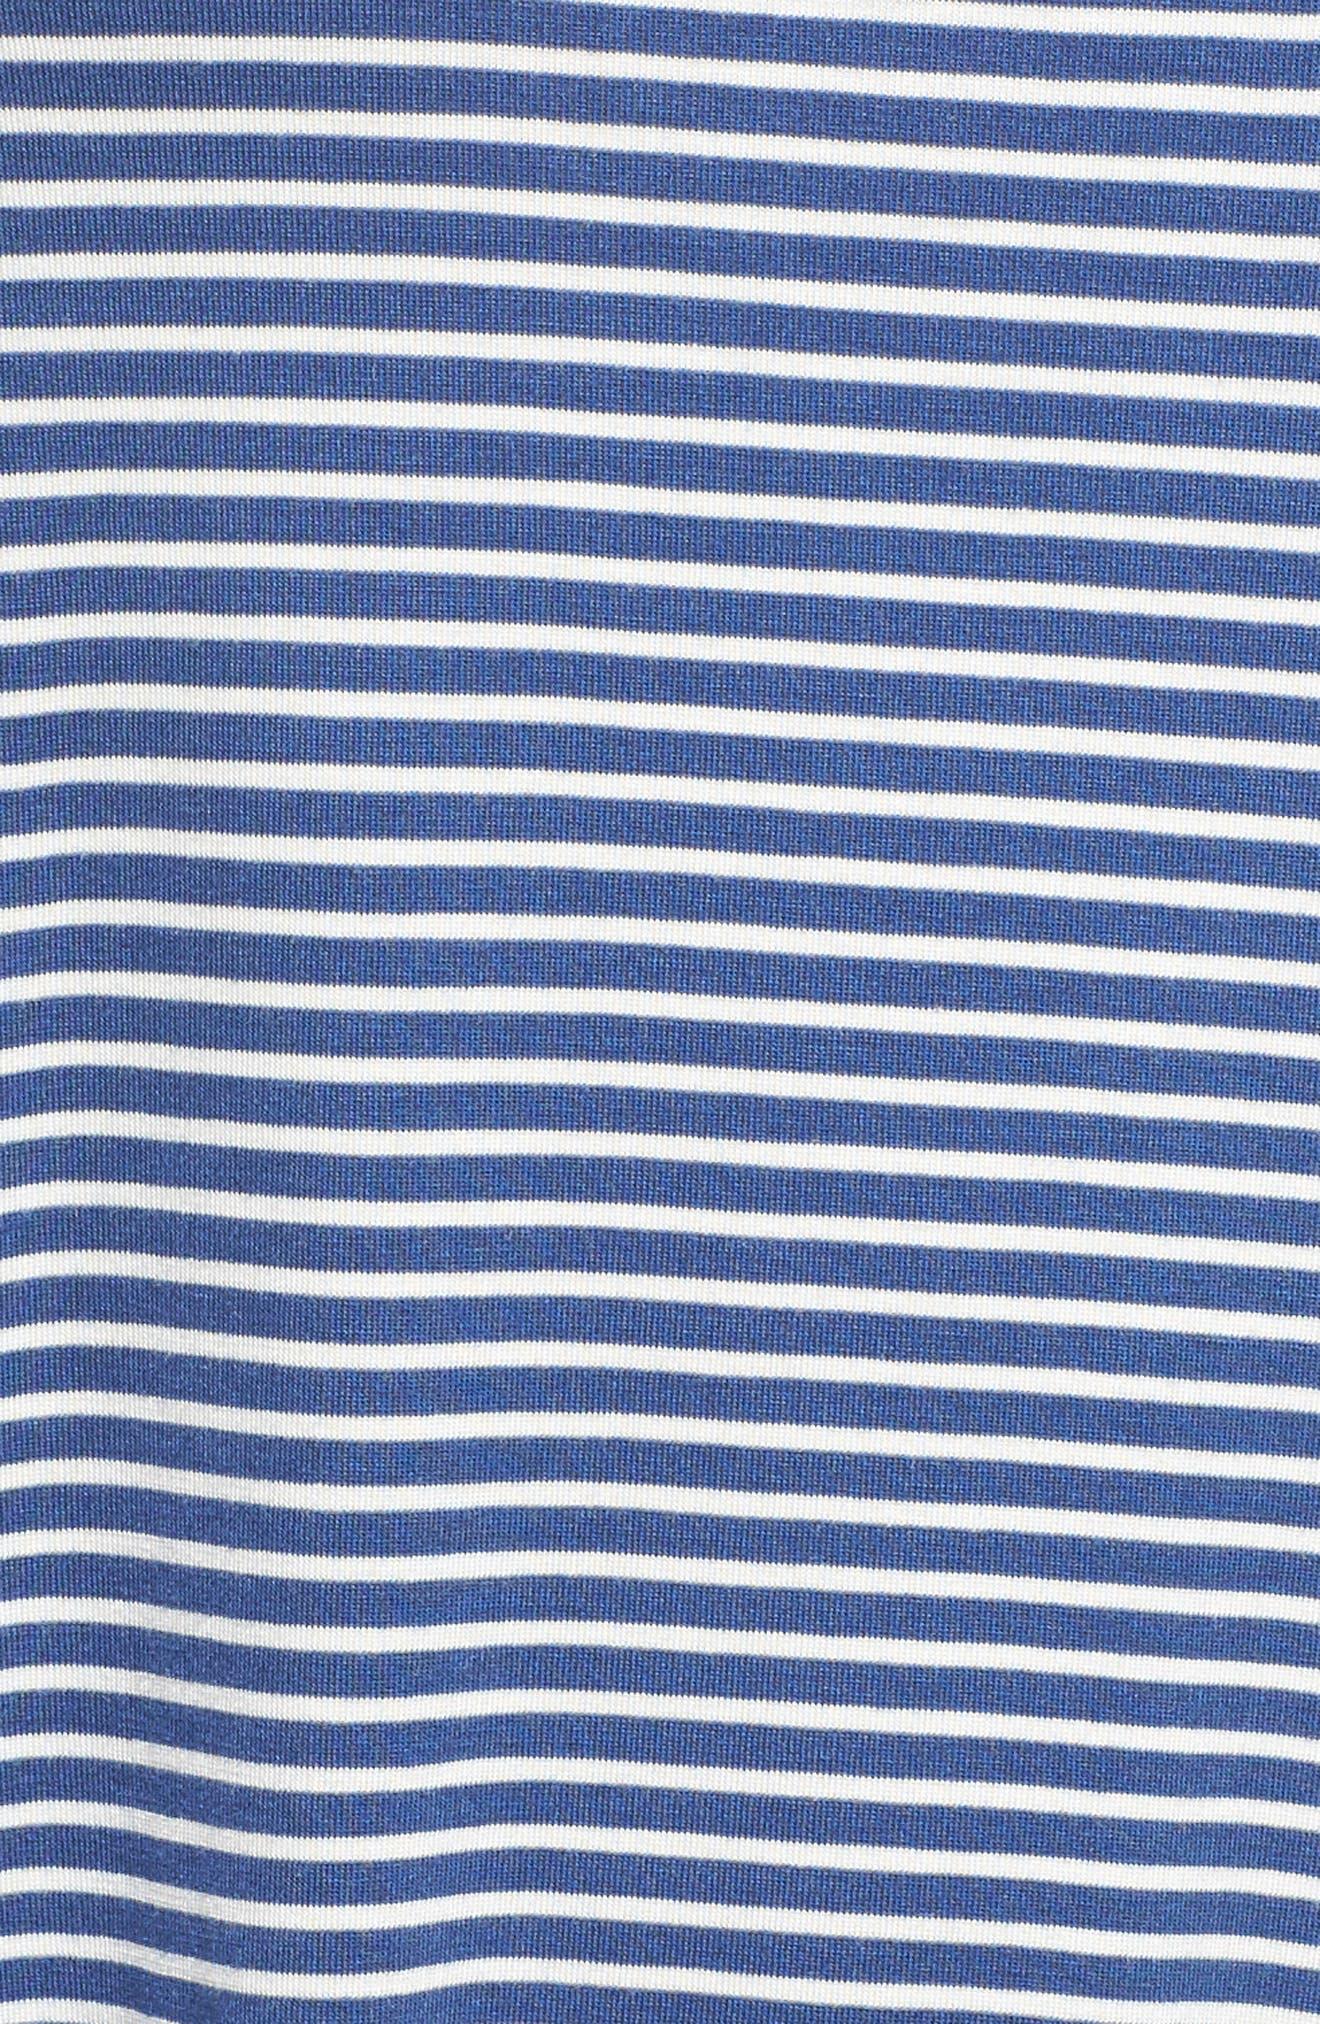 Ruffle Cuff Stripe Top,                             Alternate thumbnail 5, color,                             486